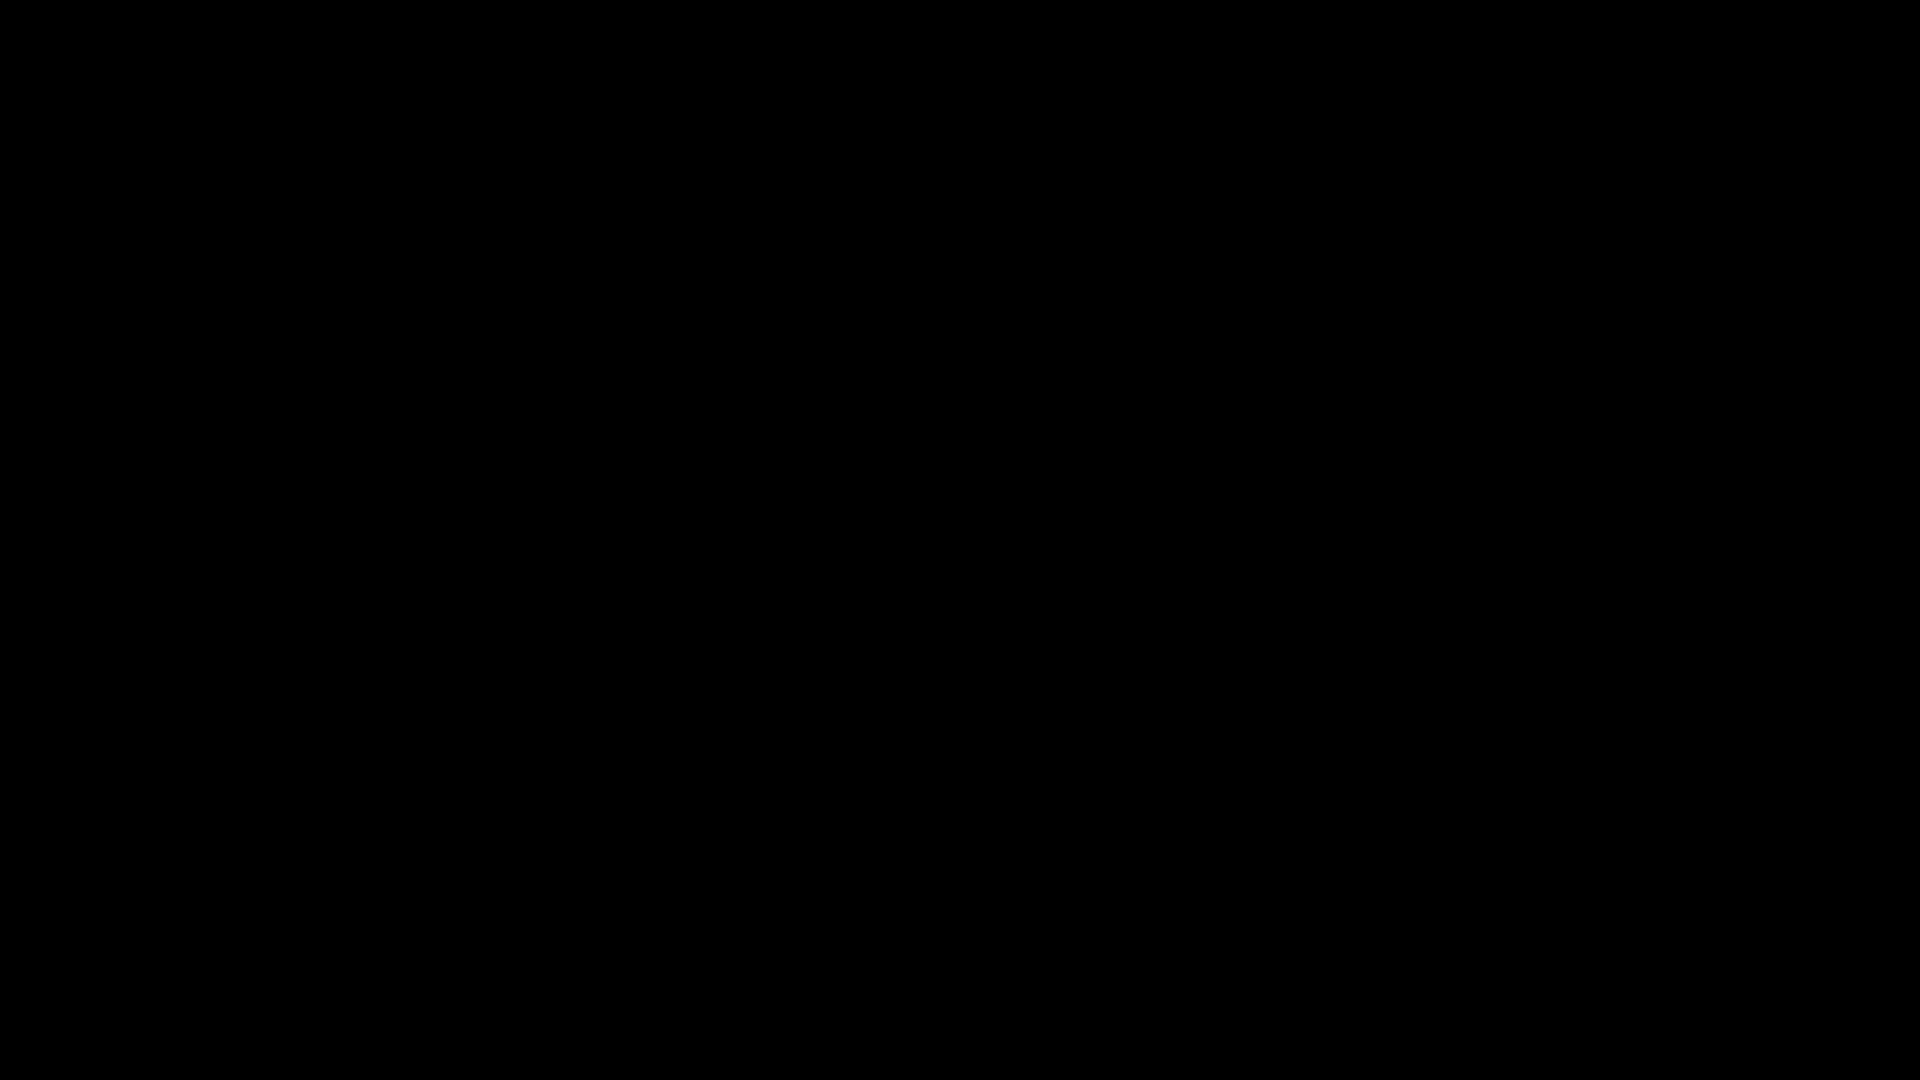 Wasteland 3 gameplay, Wasteland 3 trailer, Wastleand 3, game, gameplay, gameplay trailer, games, gamespot, gaming, inXile, juego, linux, mac, pc, playstation 4, ps4, video game, xbone, xbox one, xone, Wasteland 3 - Gameplay Trailer GIFs